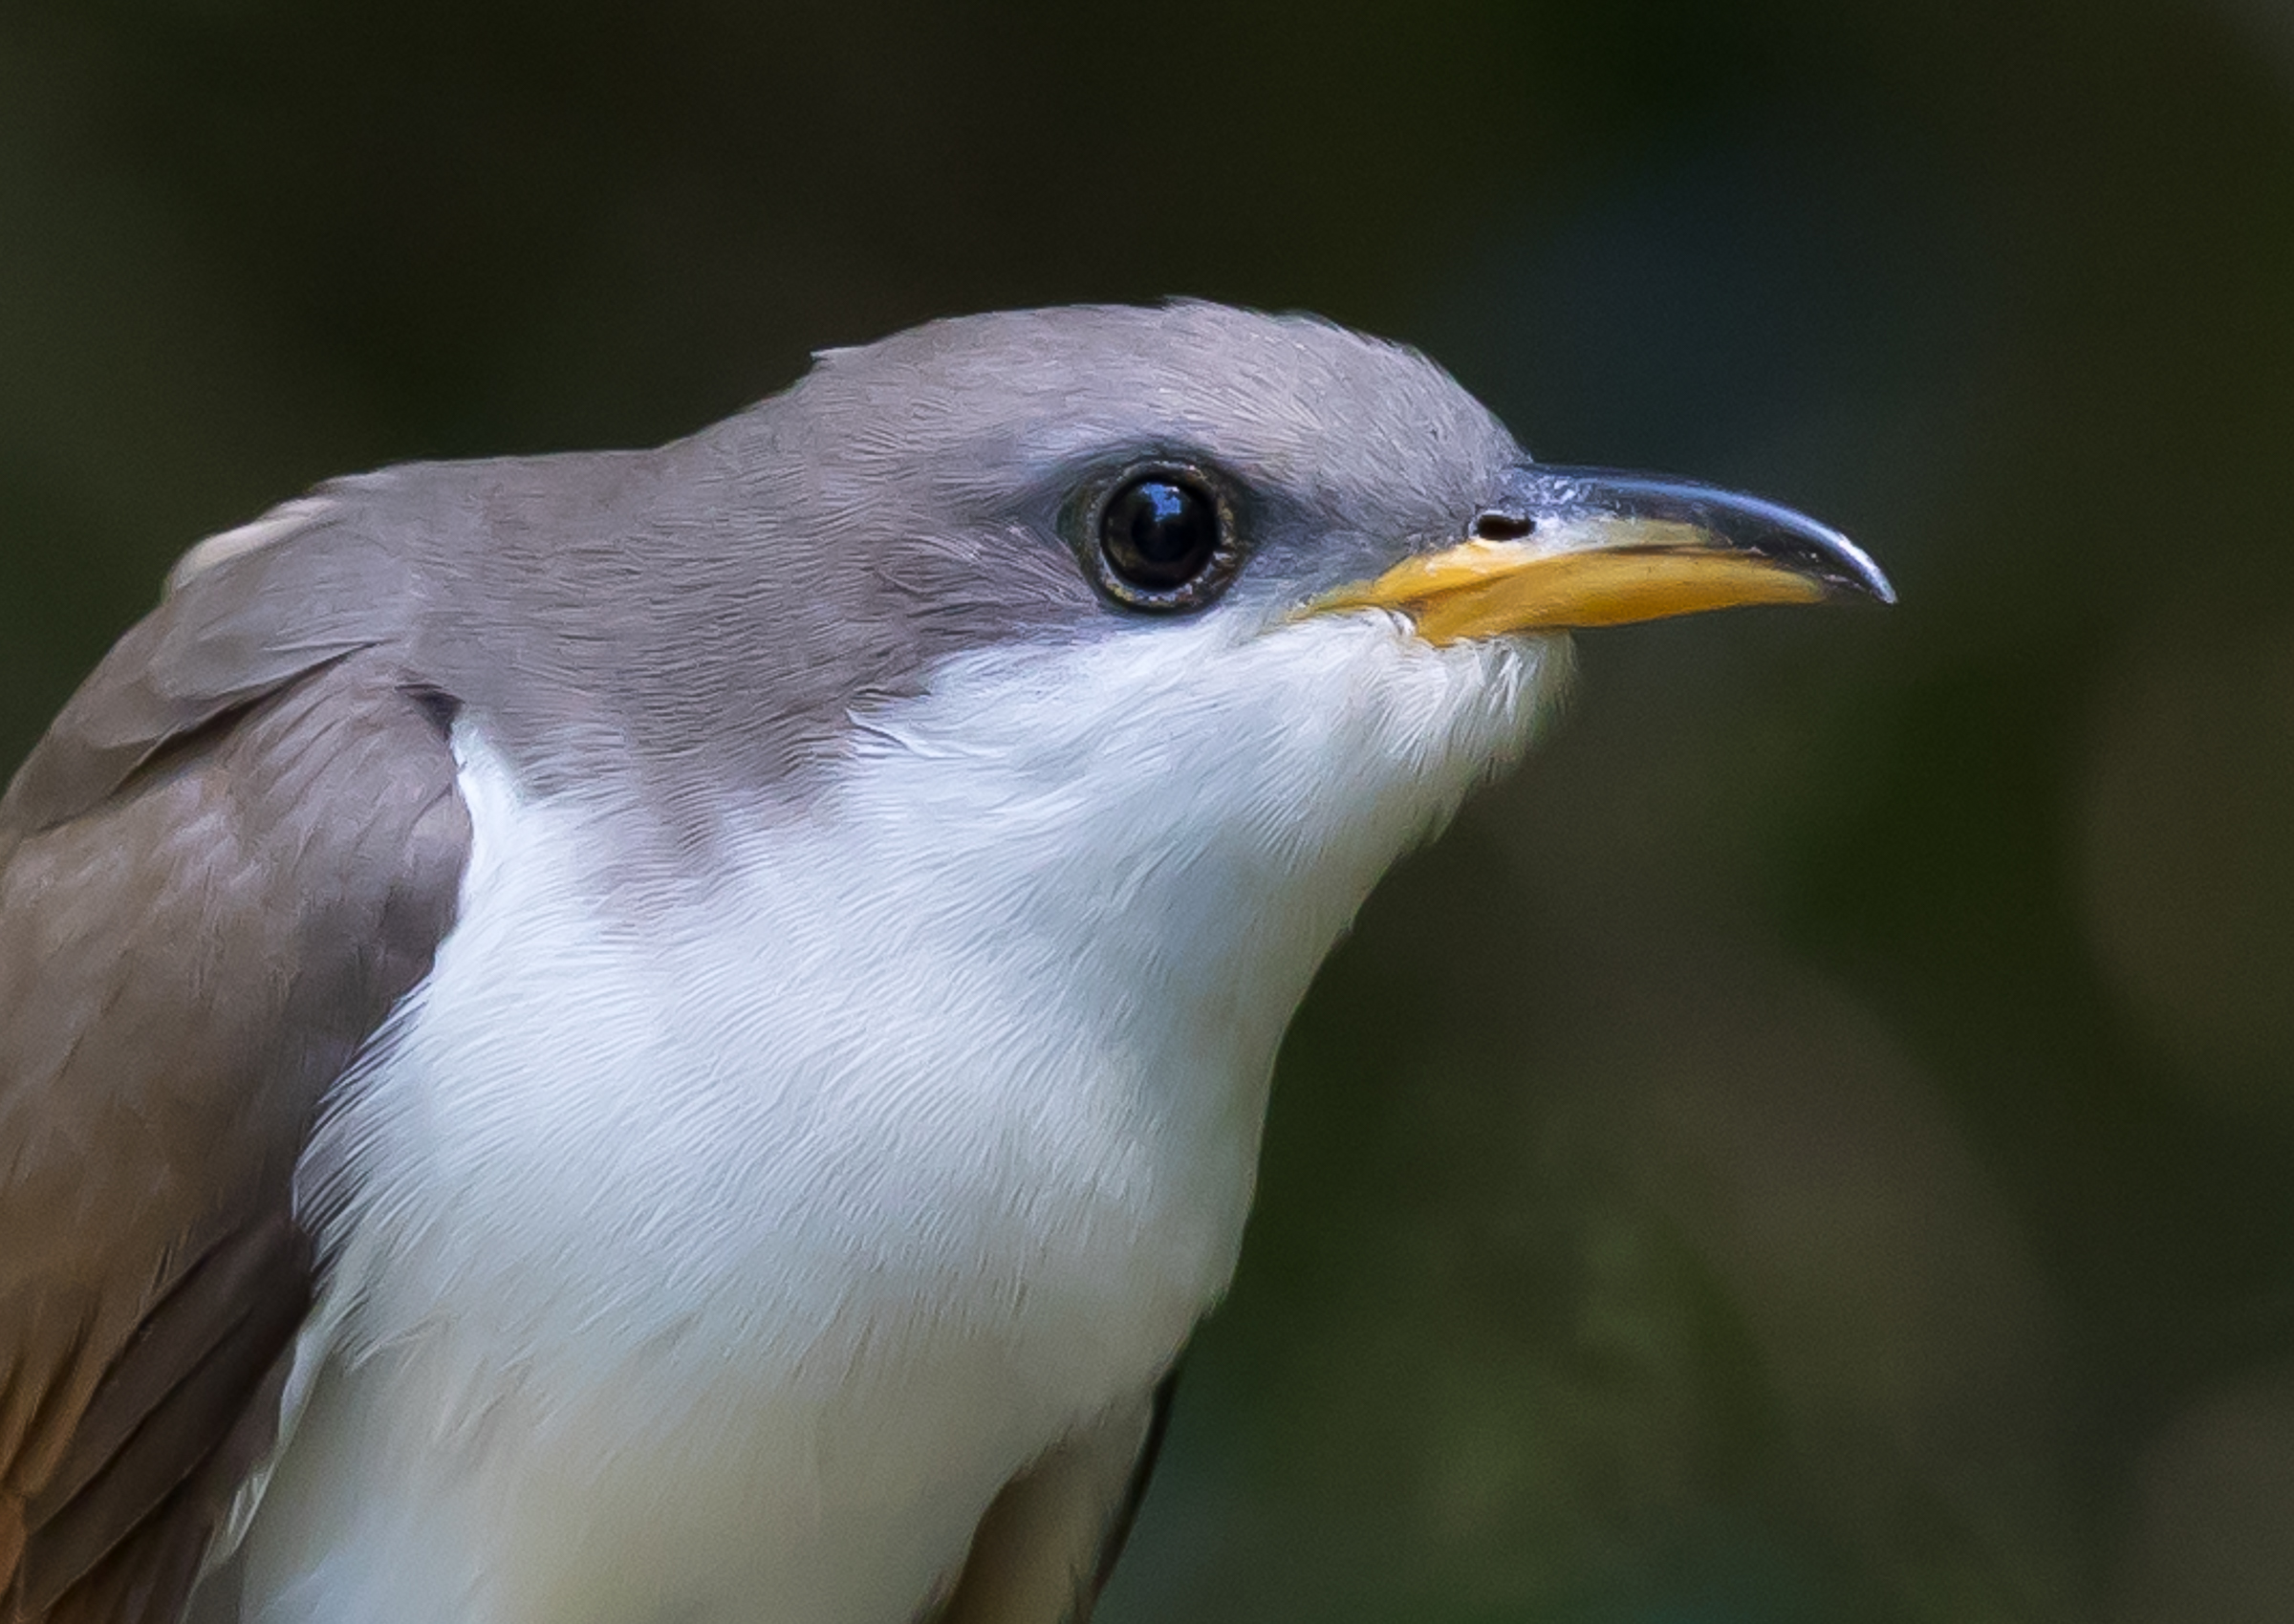 Yellow-billed Cuckoo, James Giroux